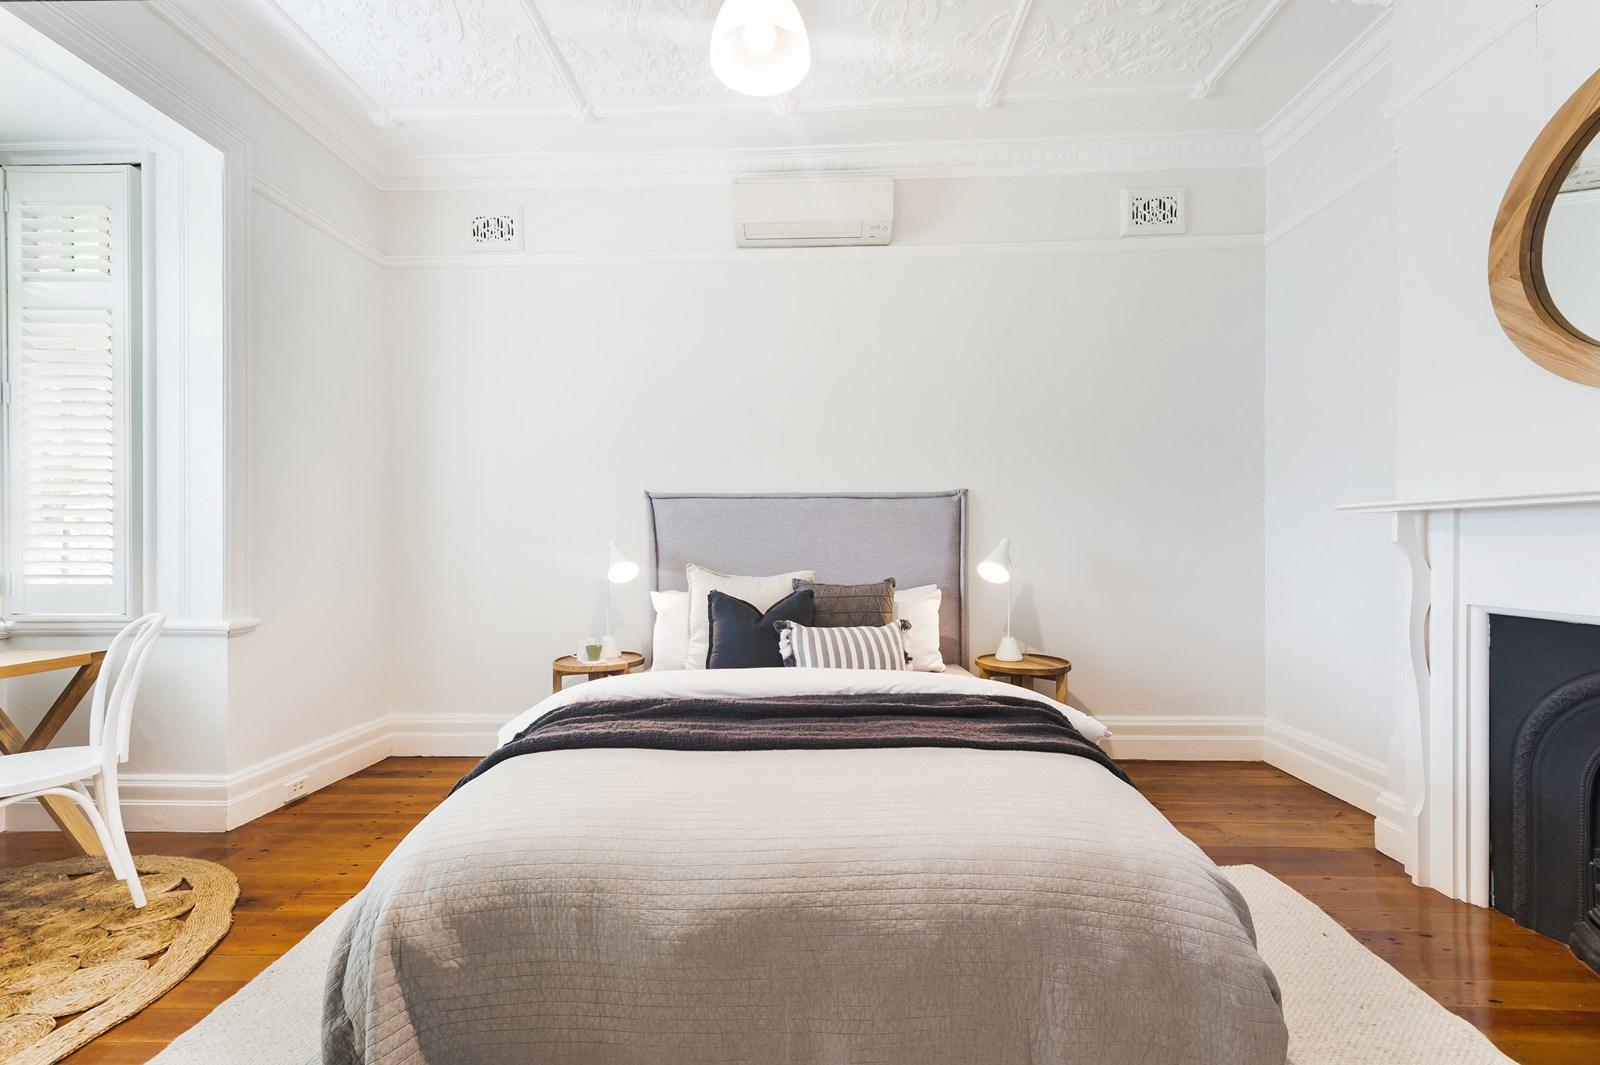 Tavistock Bedroom Furniture 37 Tavistock Street Drummoyne Nsw 2047 House For Sale